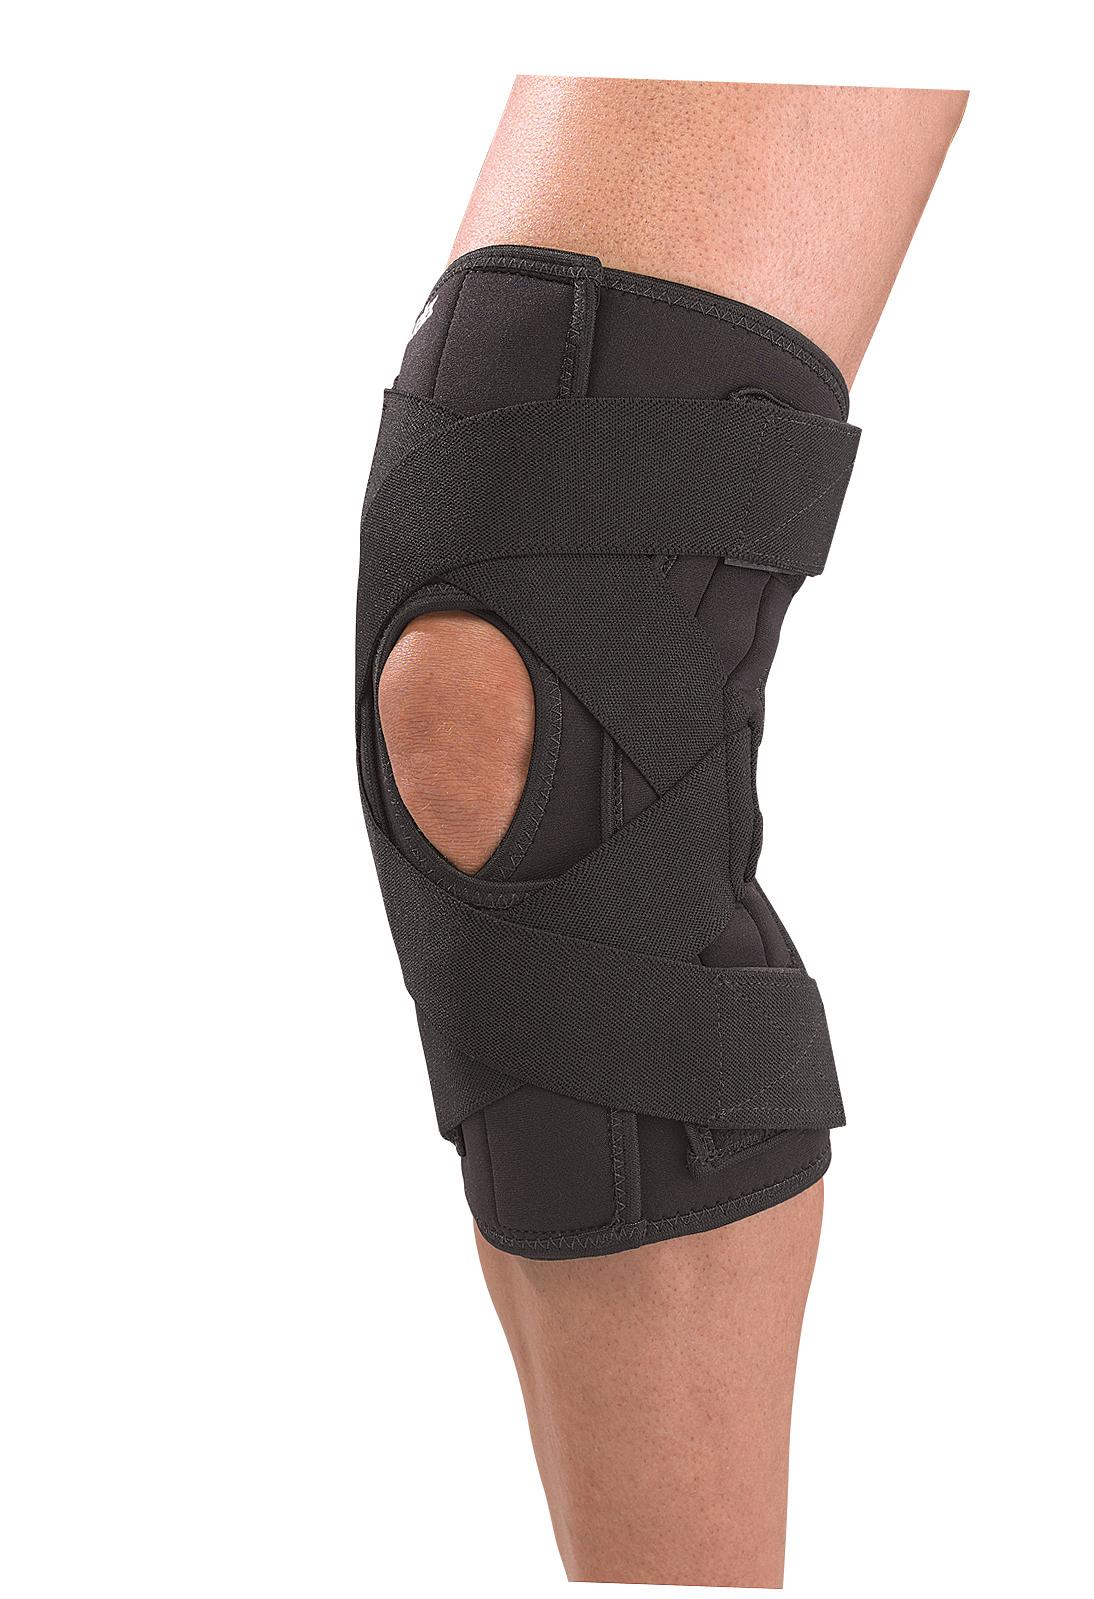 wraparound-knee-brace-deluxe-black-md-230md-74676637020-lr.jpg